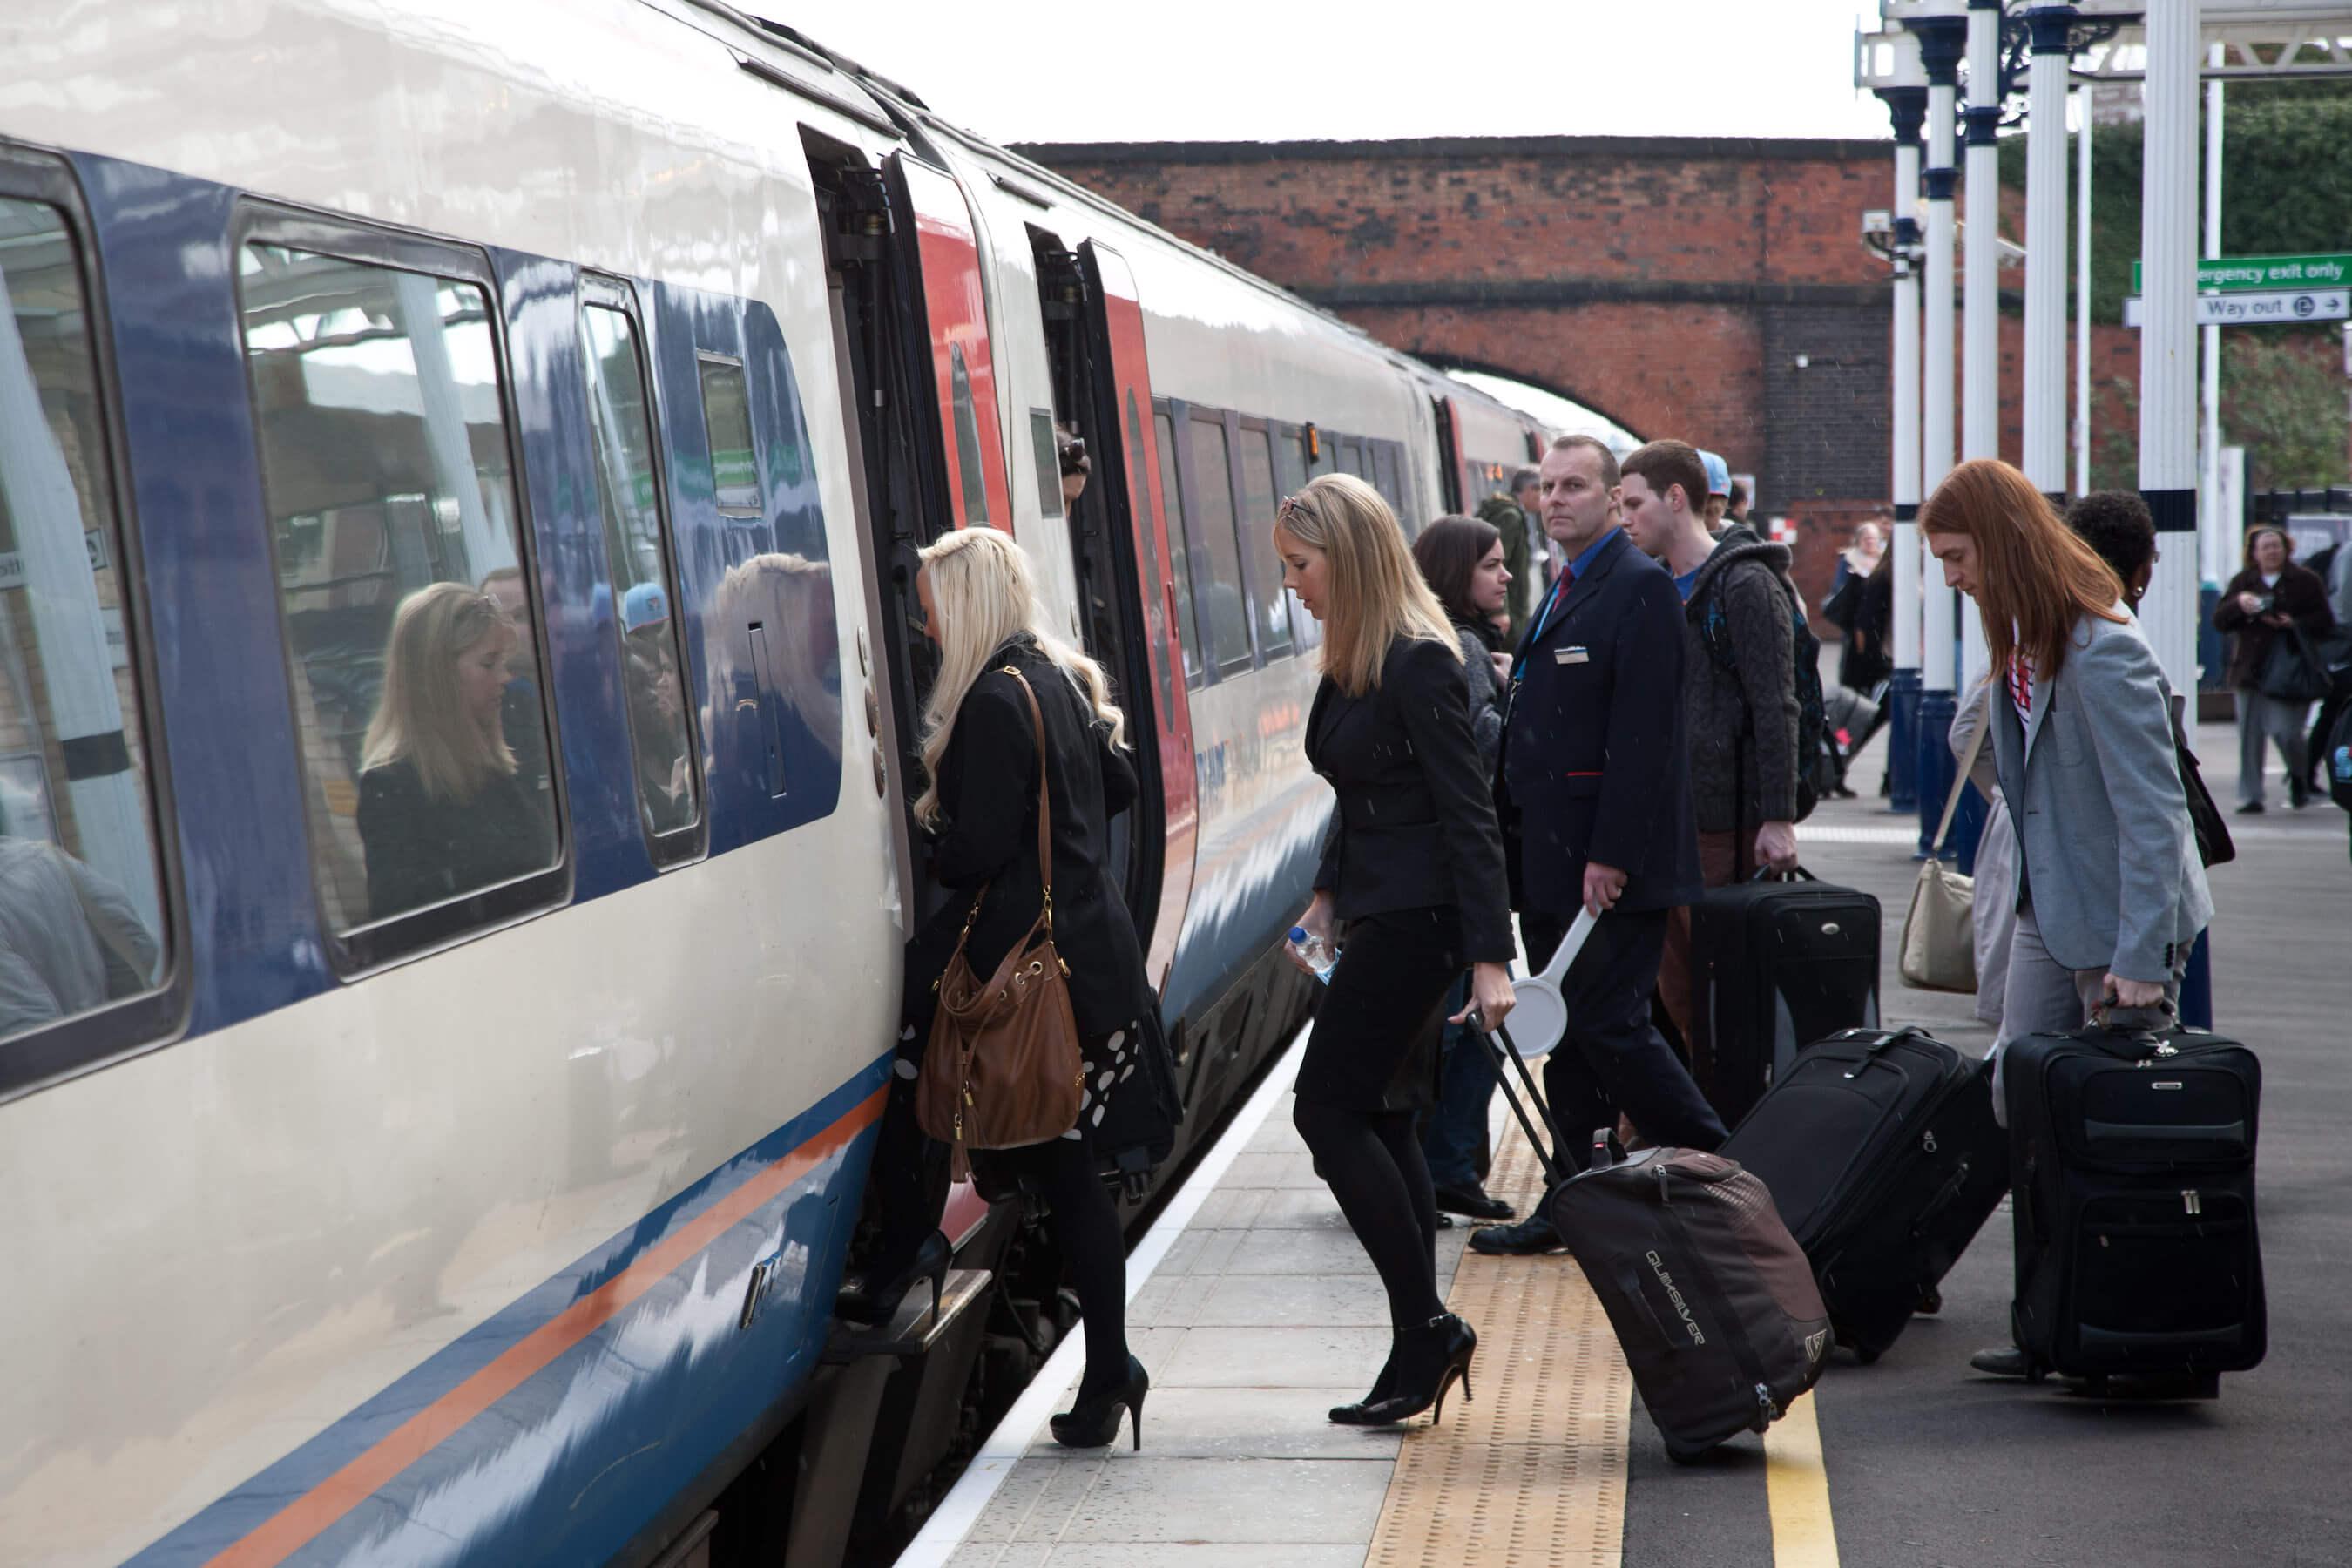 Train passengers on platfrom